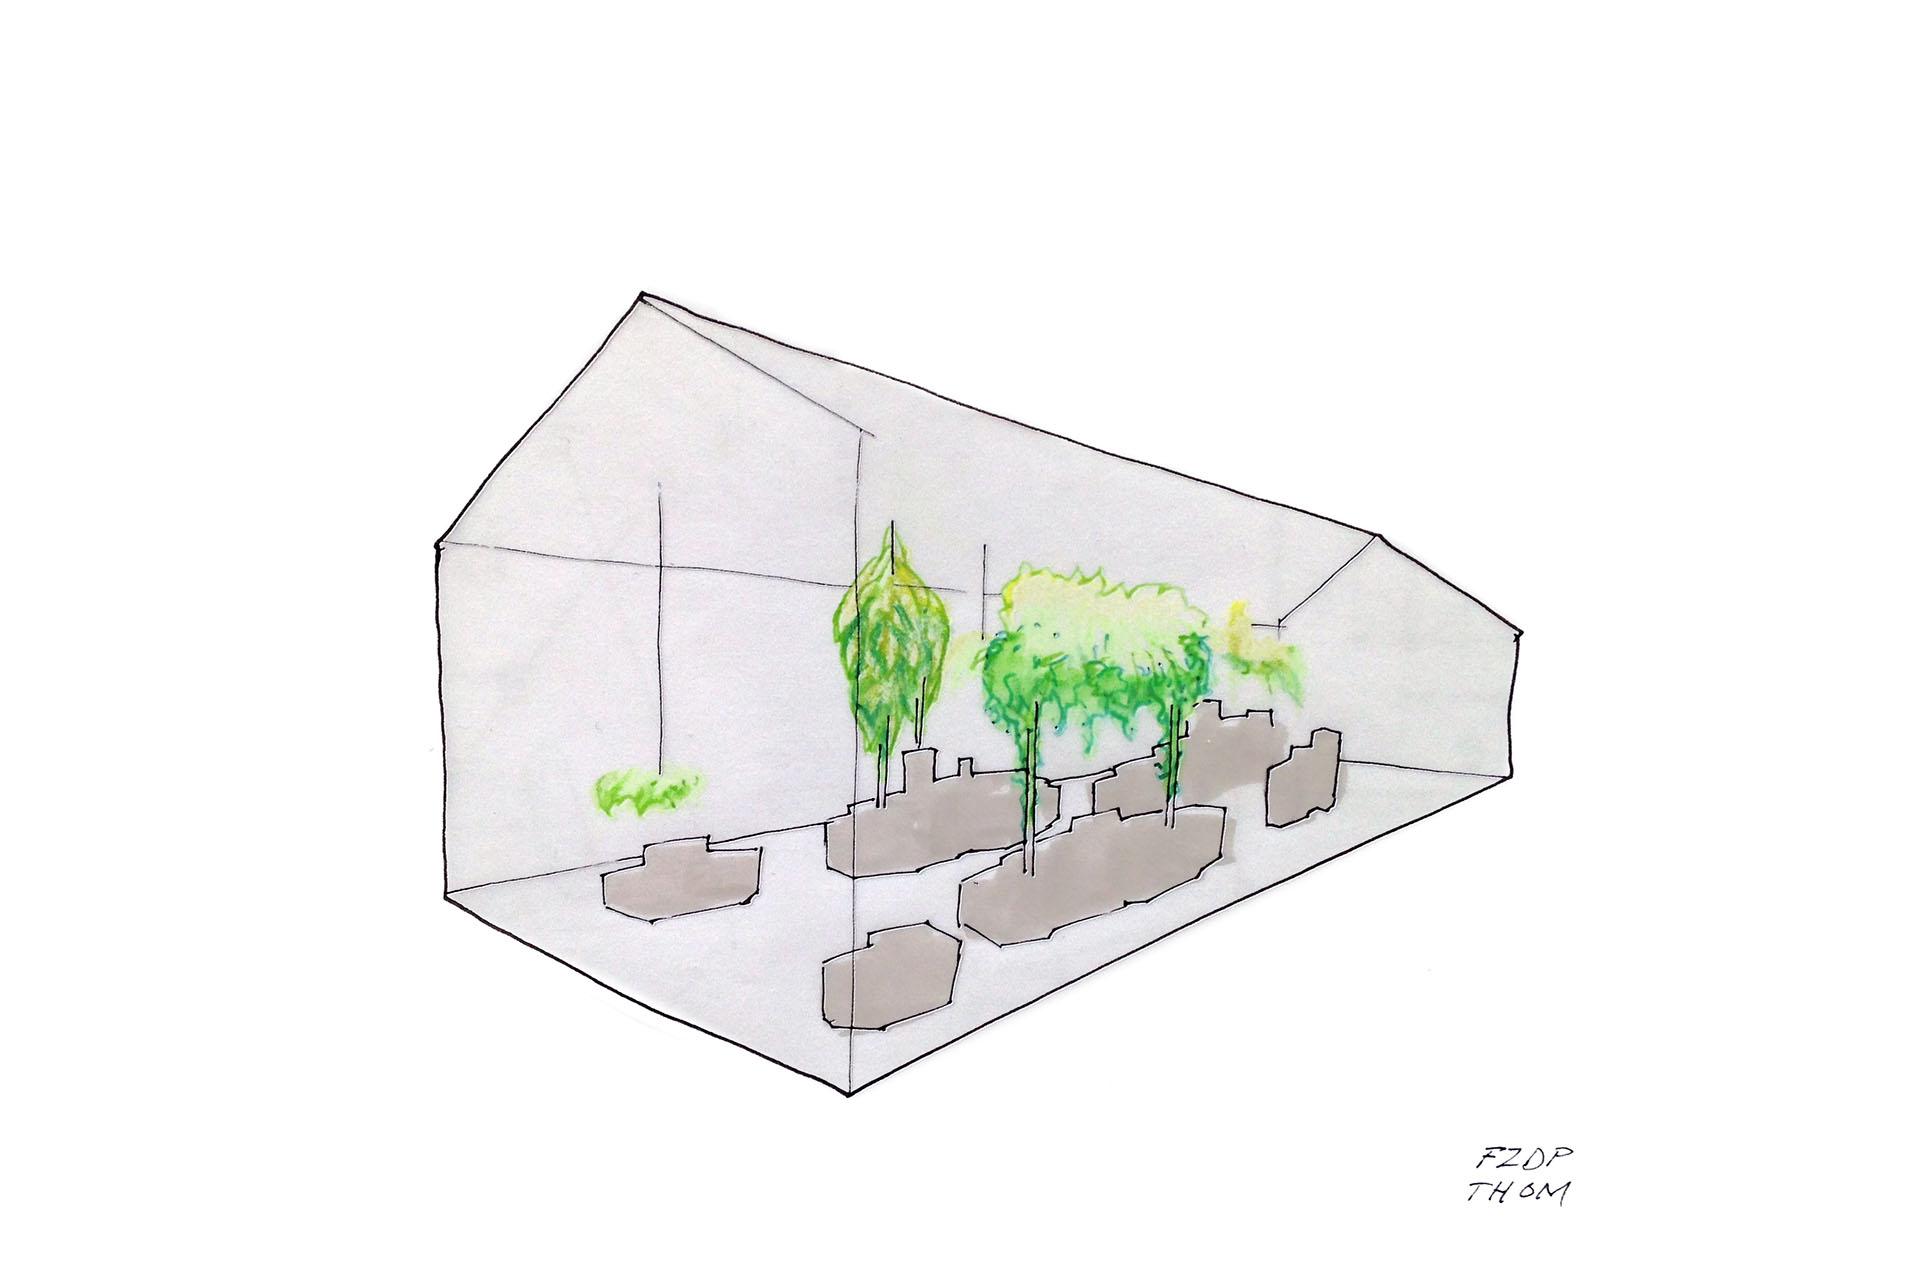 concrete islands flip ziedses des plantes design studio. Black Bedroom Furniture Sets. Home Design Ideas